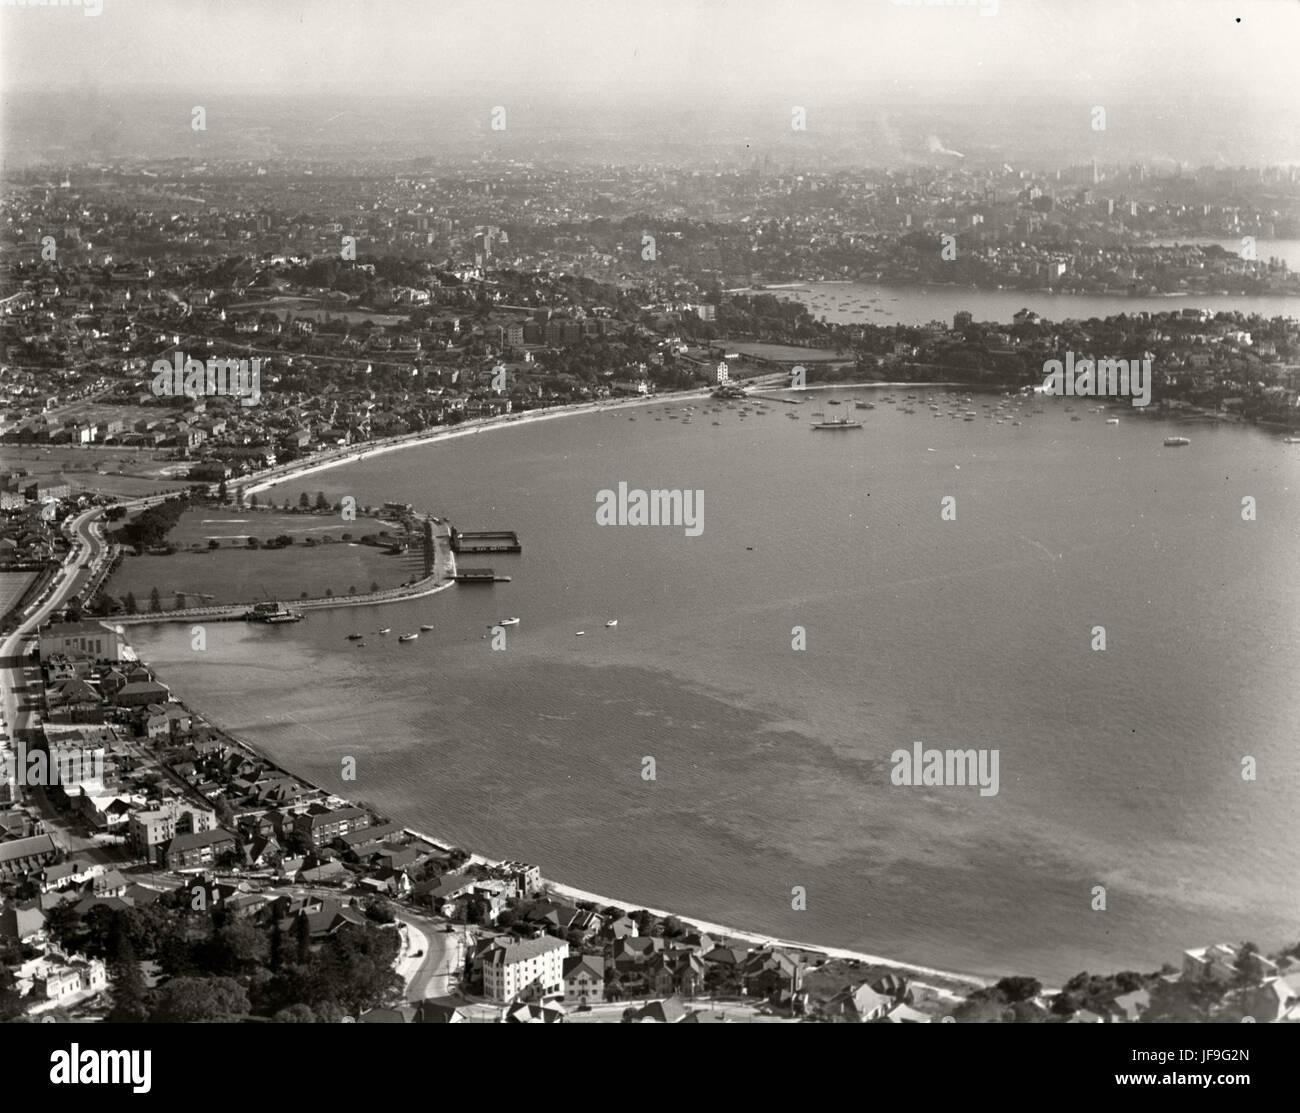 Rose Bay - 2 Aug 1937 30271784885 o - Stock Image